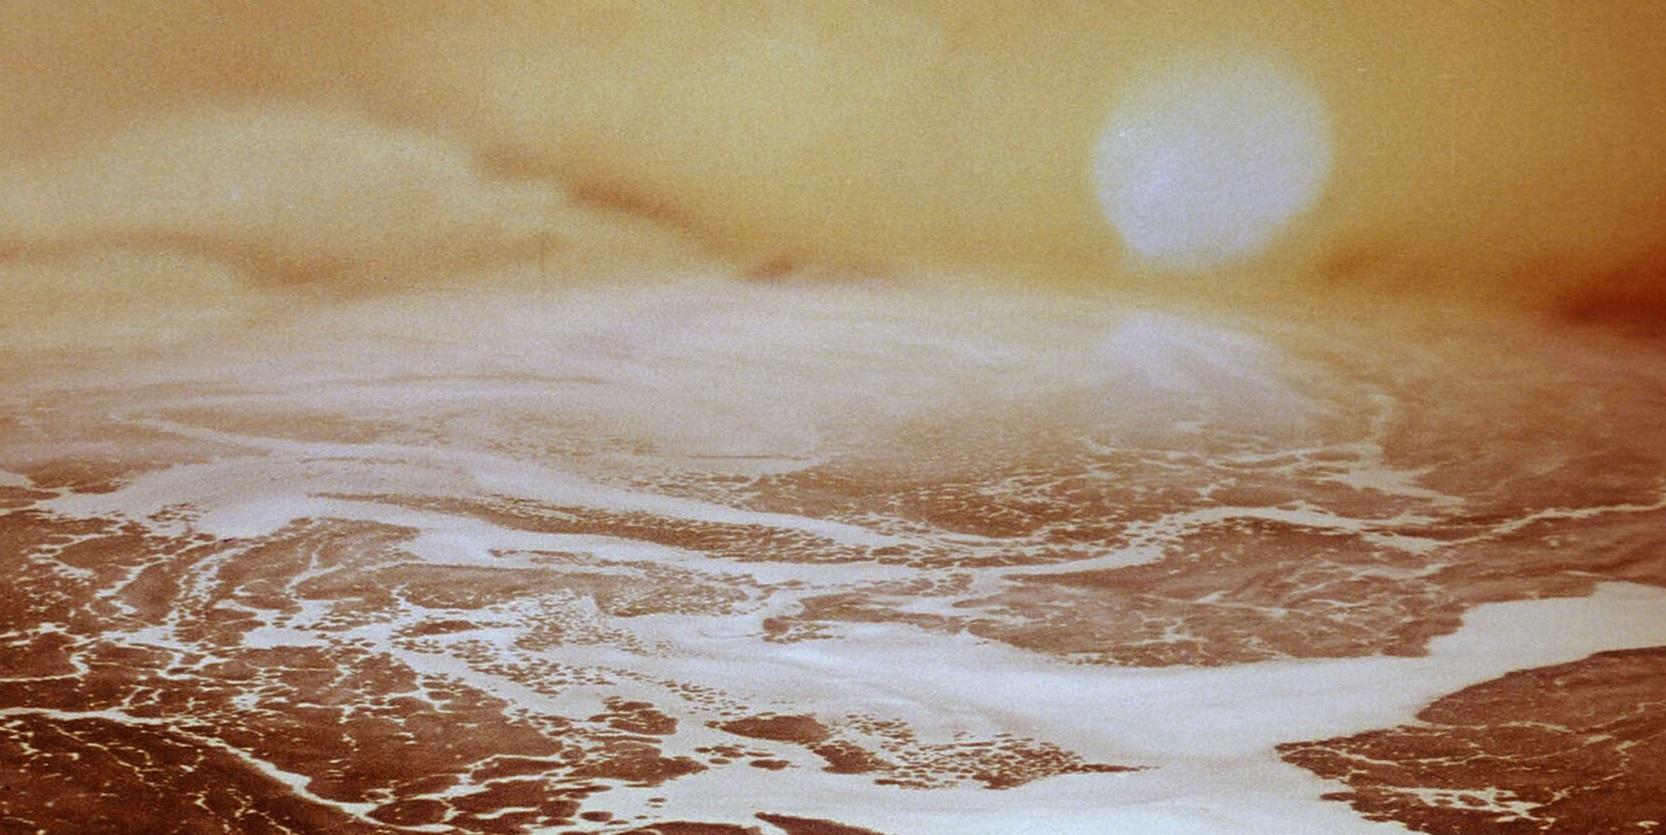 Кадр из фильма Андрея Тарковского «Солярис» (1972)